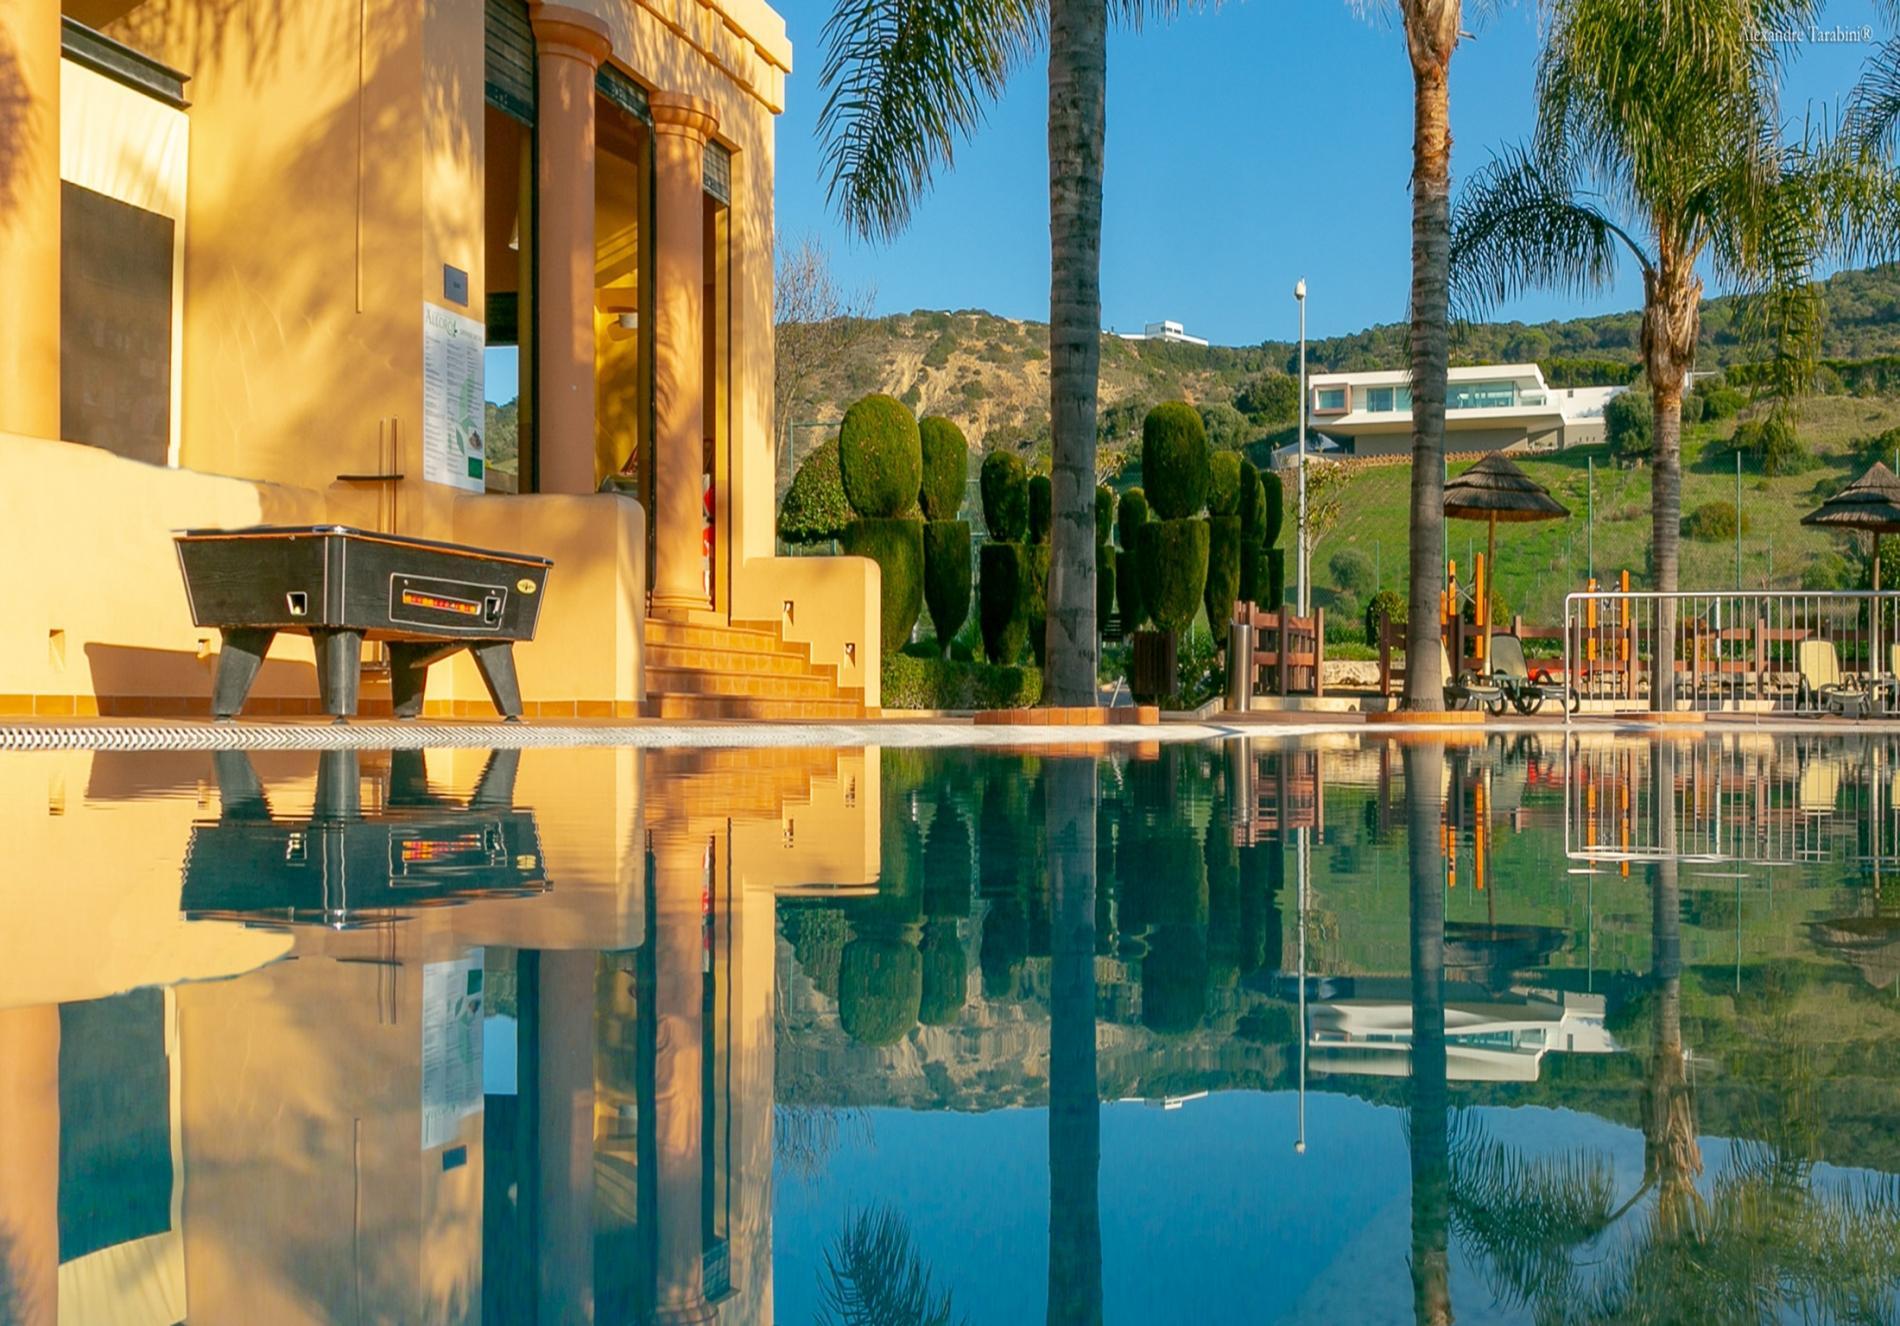 Ferienwohnung B29 - LuzBay Duplex (2558092), Luz, , Algarve, Portugal, Bild 30